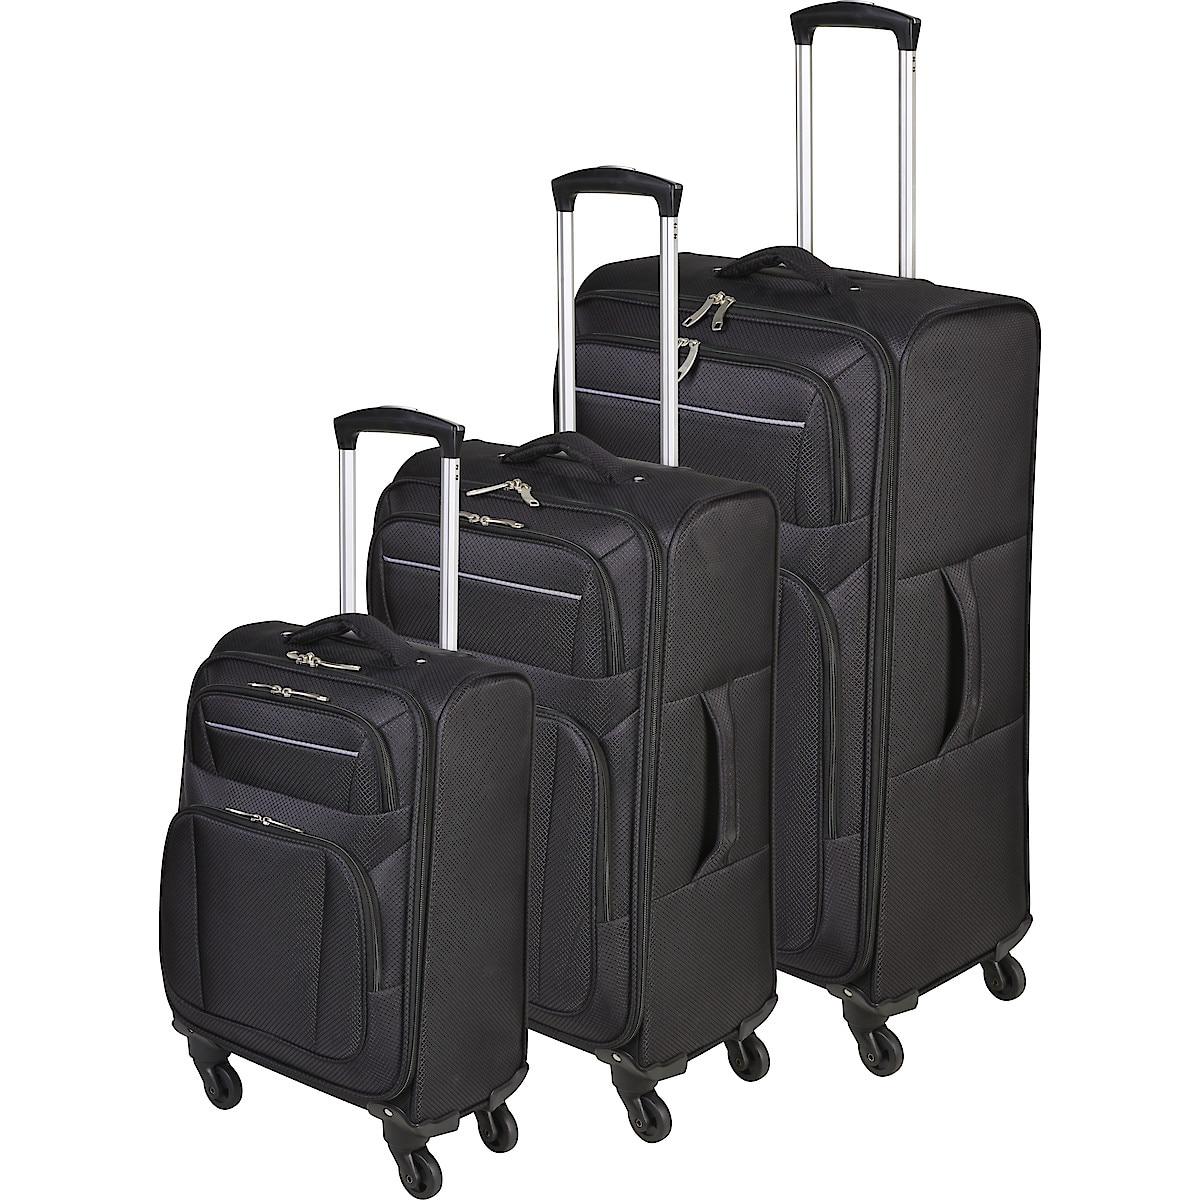 Resväskor 3-pack Asaklitt Lightweight